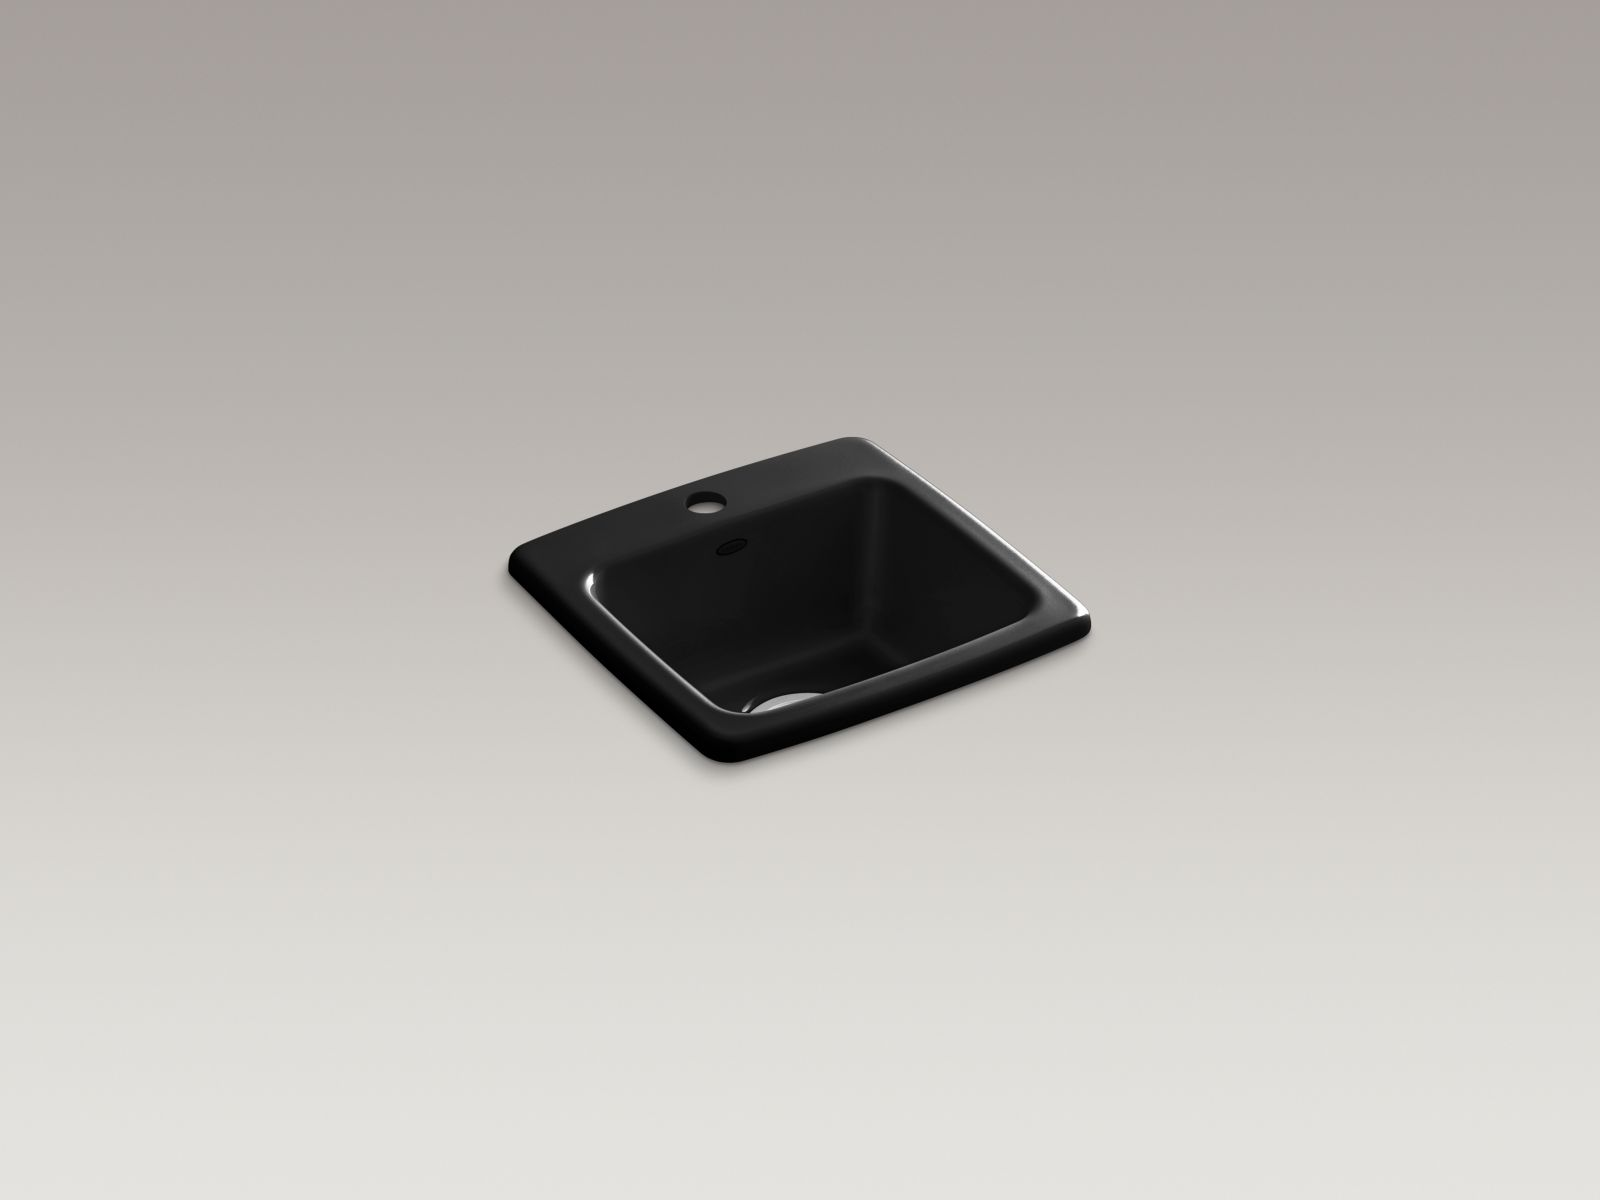 Kohler K-6015-1-7 Gimlet Self-rimming Single-bowl Bar Sink with Single Faucet Hole Black Black